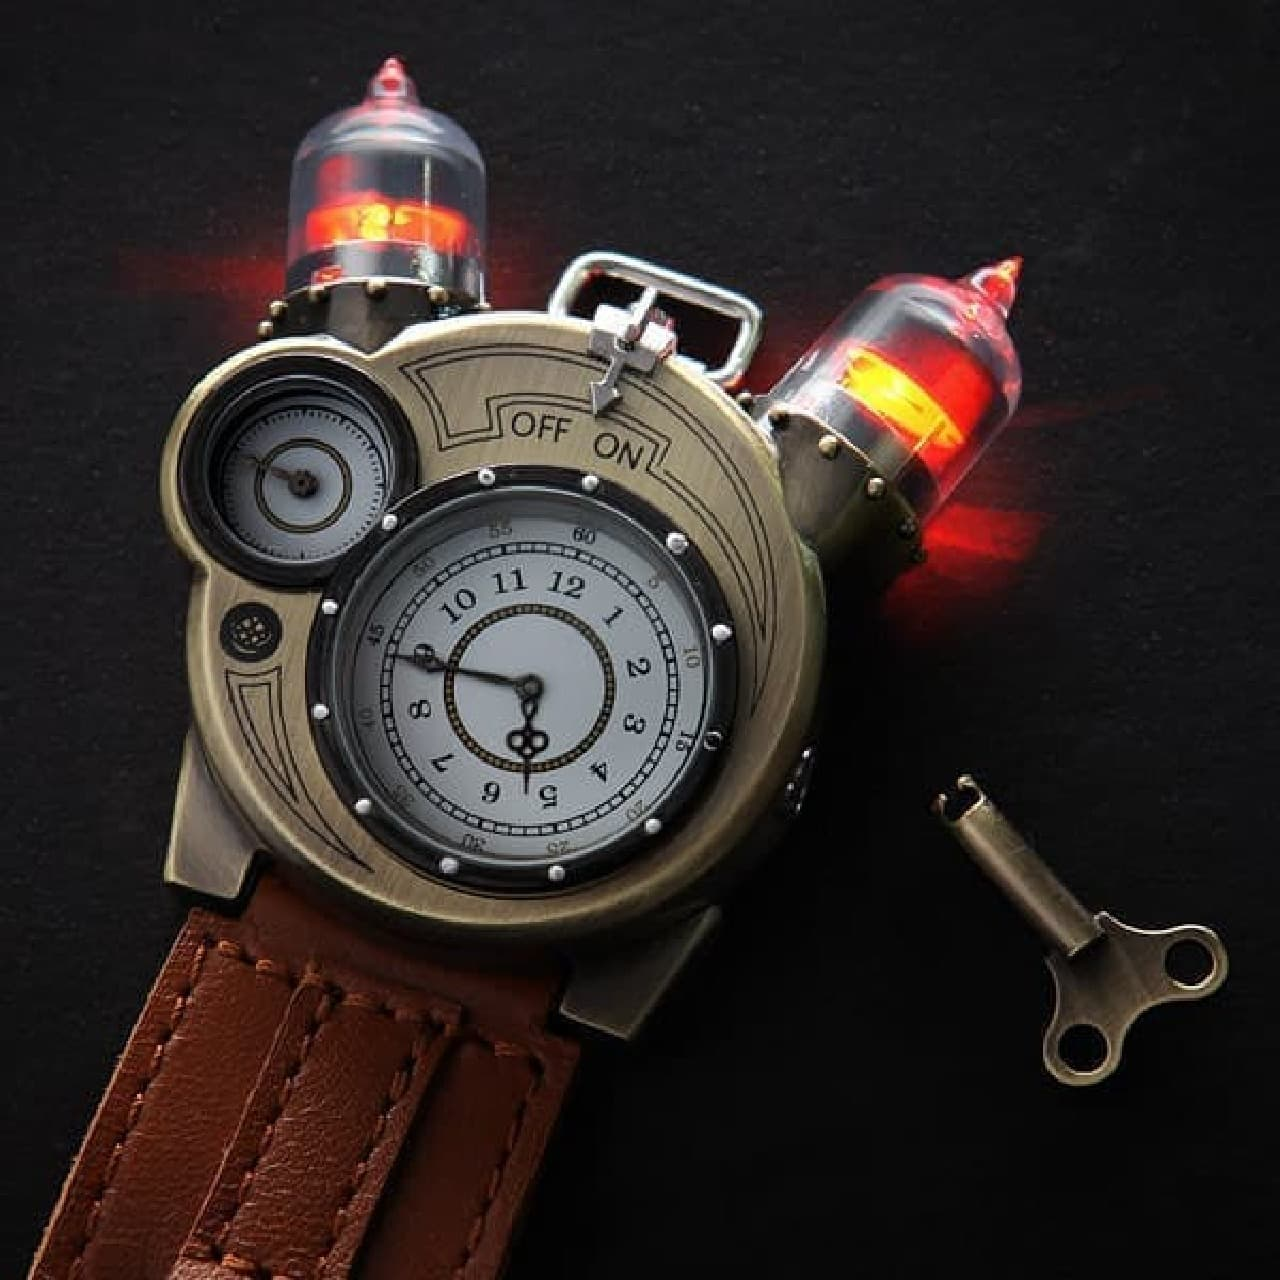 「Tesla Watch」の特徴は、真空管風ライトが取り付けられていること  真空管で動作している?